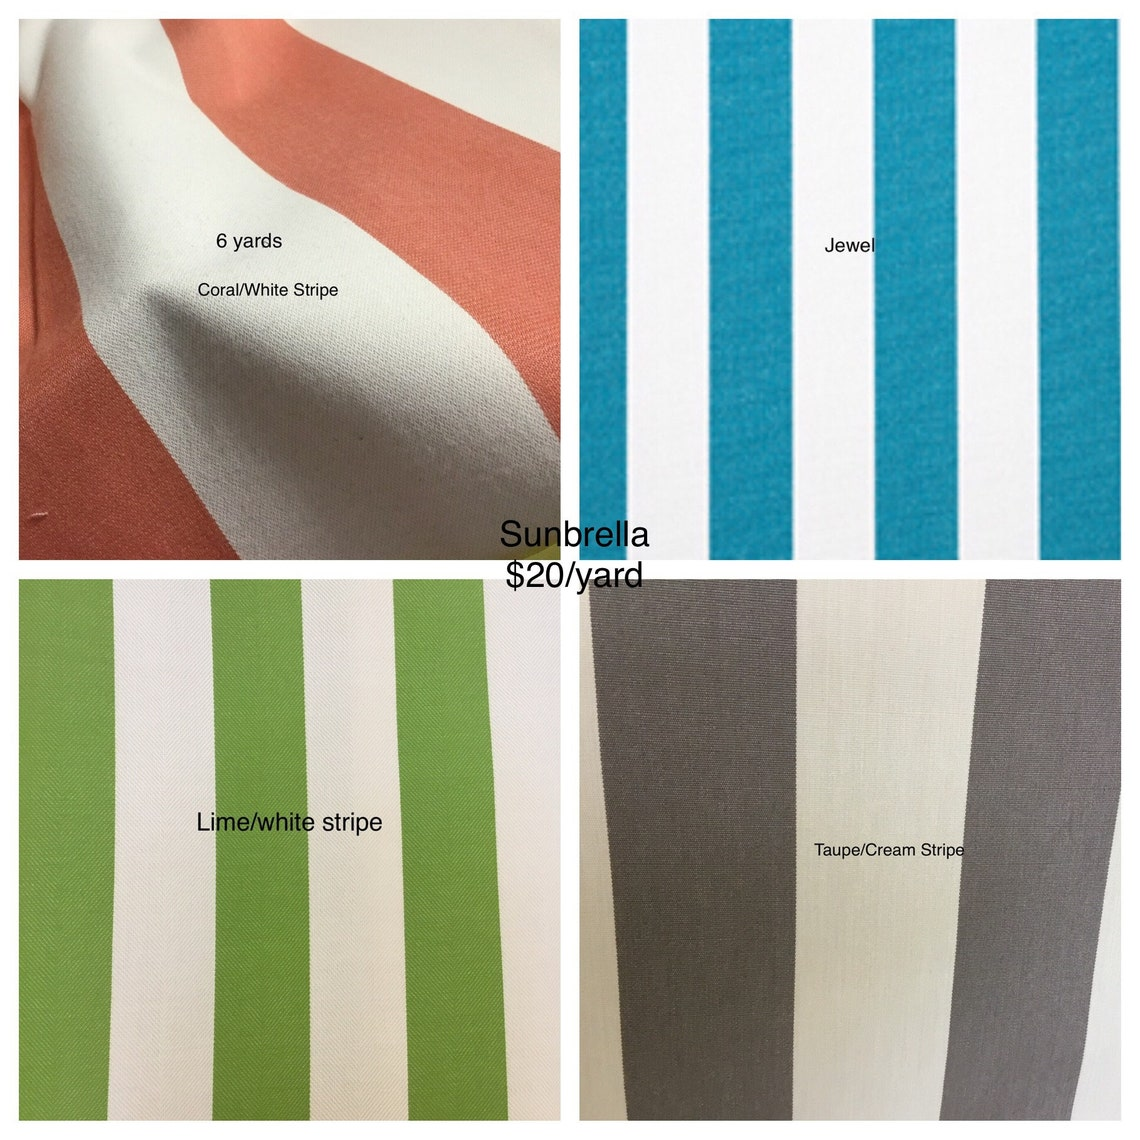 Ottoman slipcover - Footstool cover - Custom Slipcover - Custom Cube Cover - Custom Pouf Cover